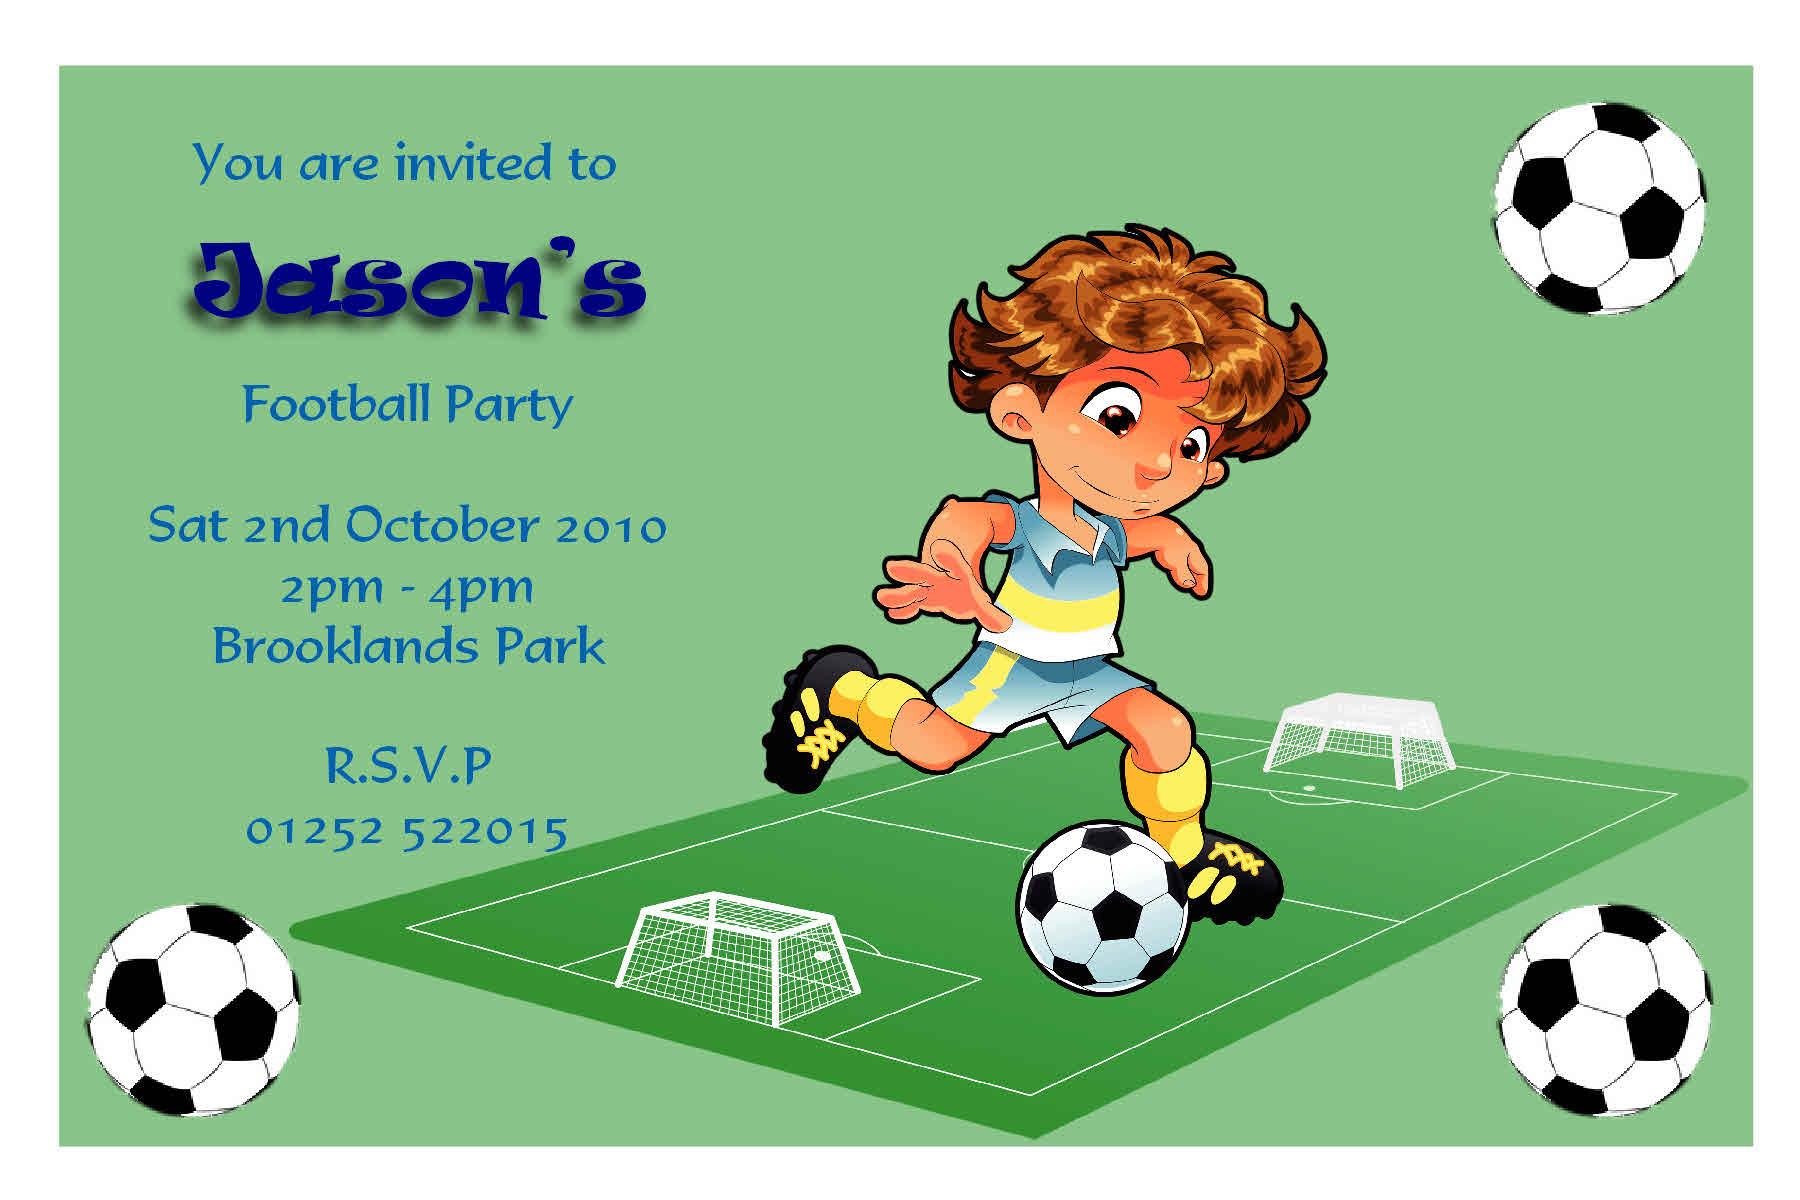 Football Birthday Invitation Template Free einmaleinshaus – Football Themed Birthday Invitations